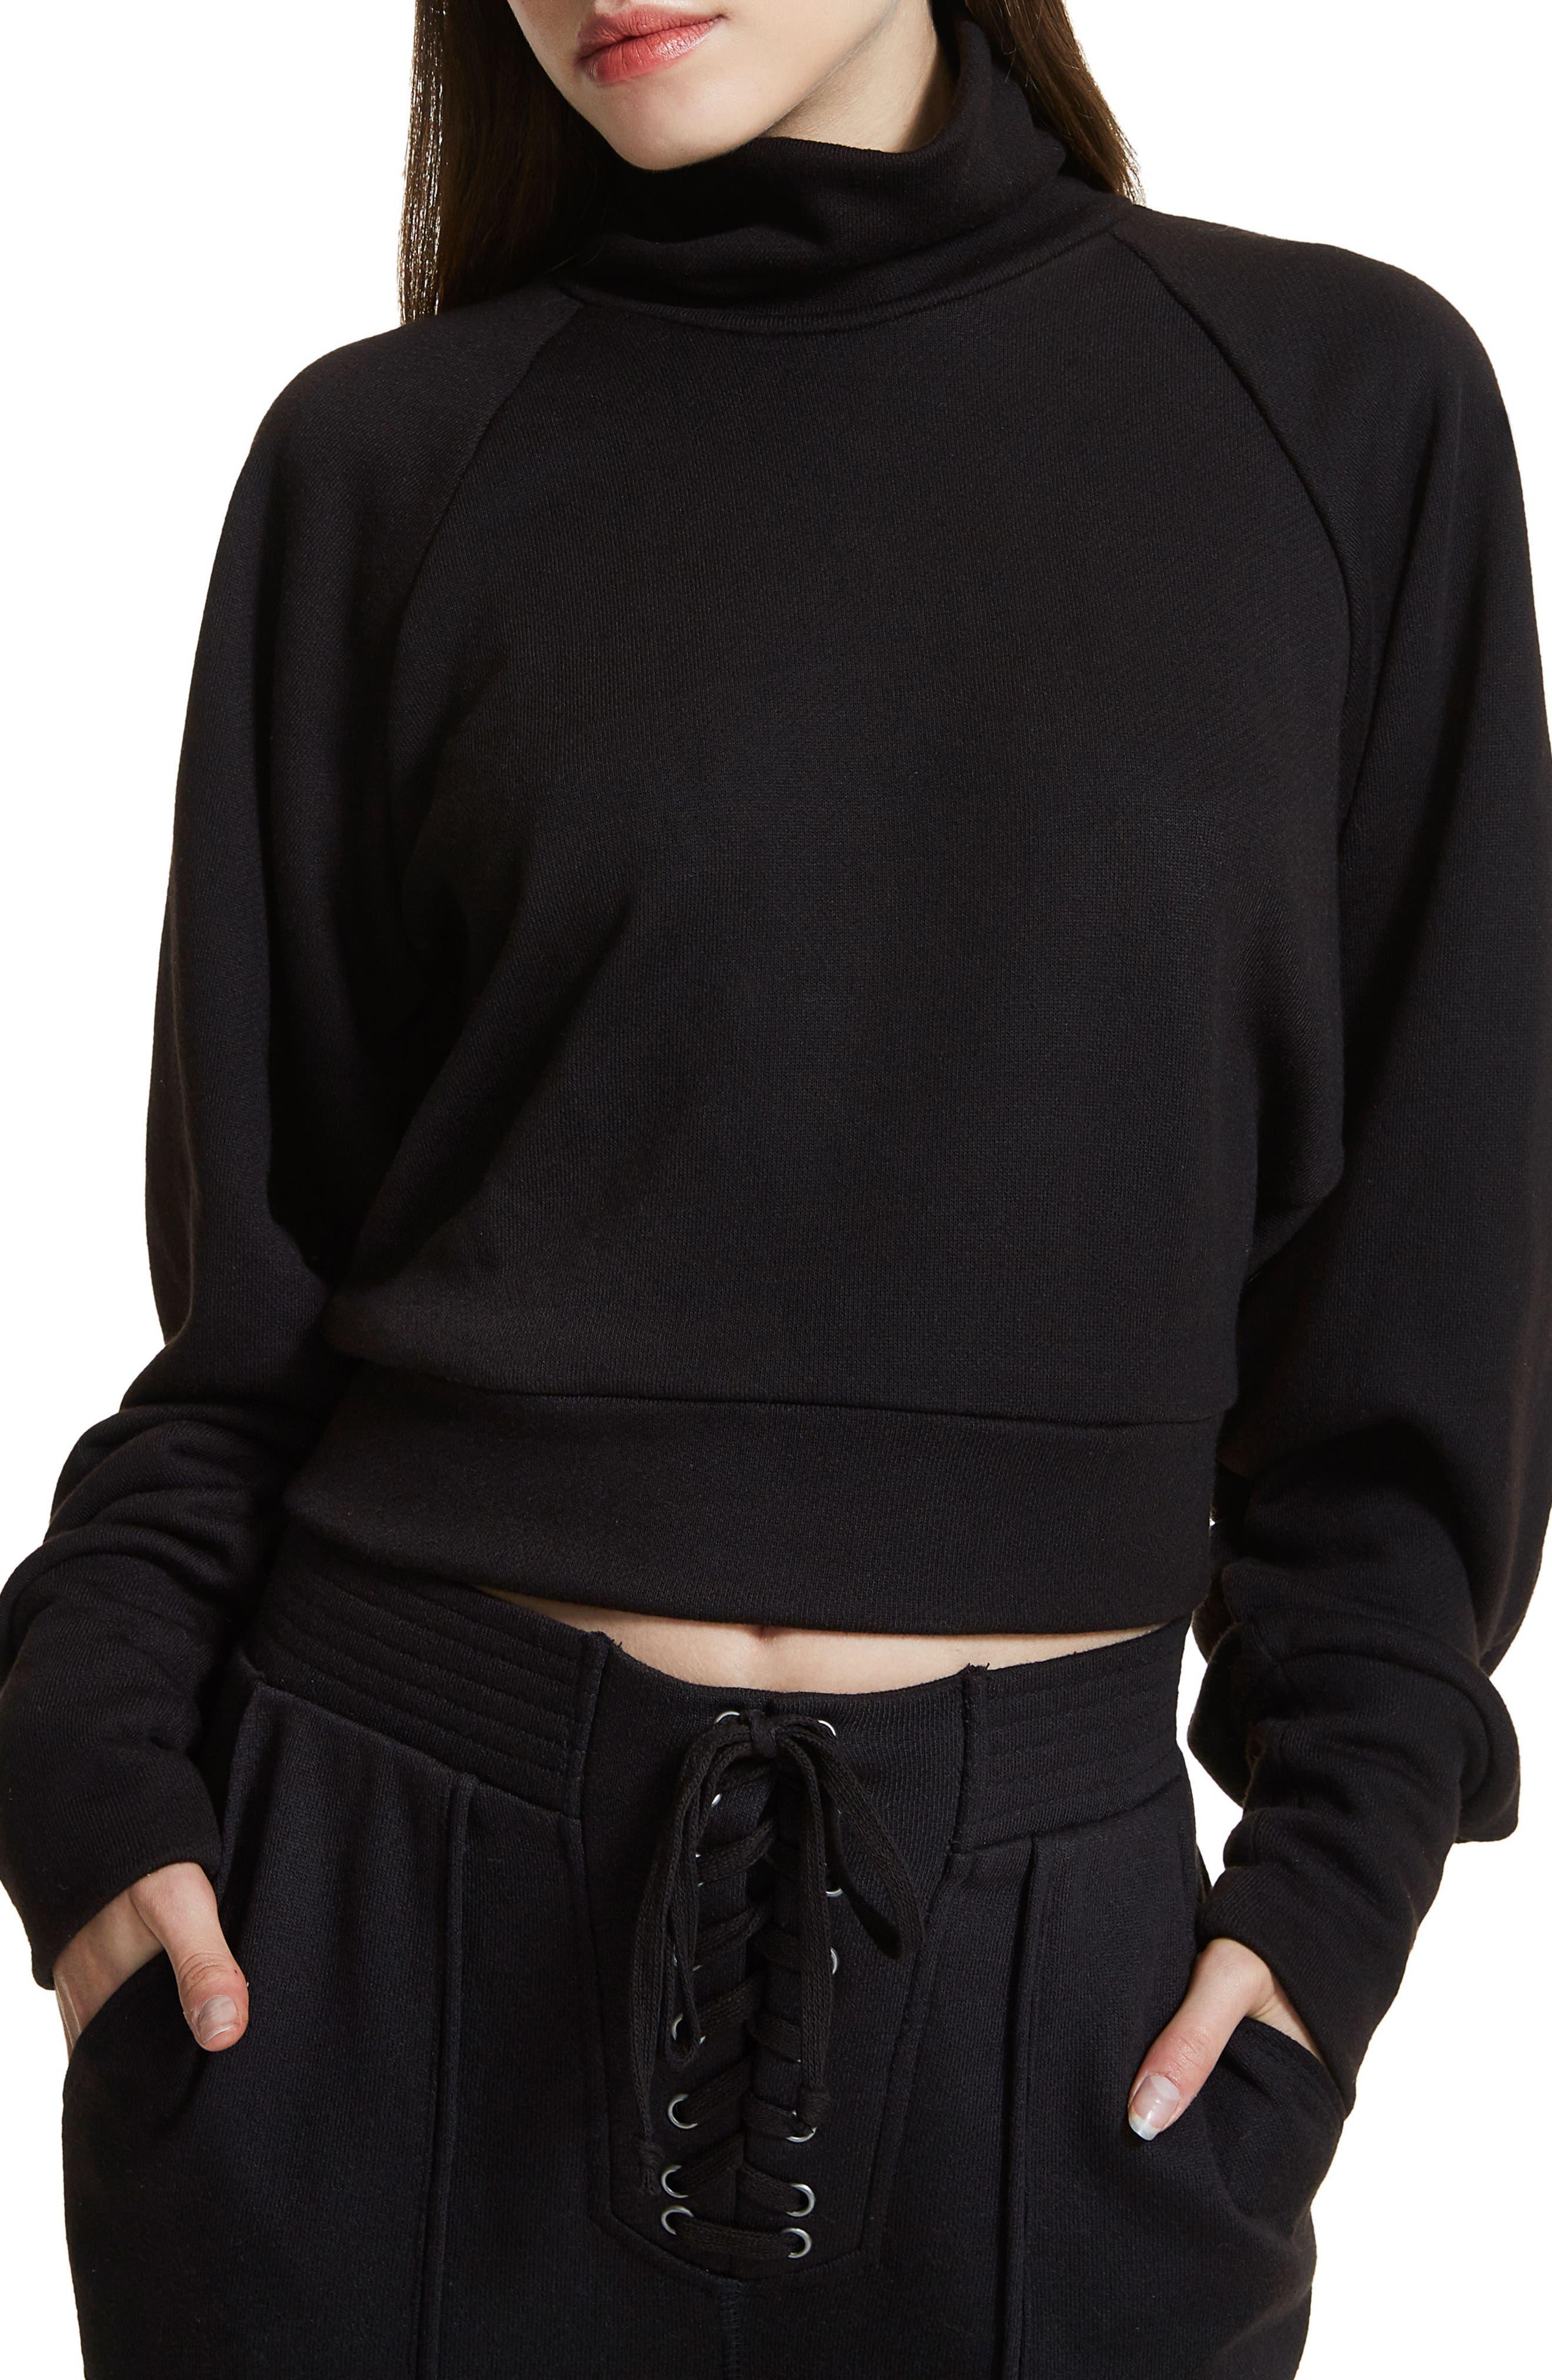 Main Image - AFRM Jaxon Crop Turtleneck Sweatshirt